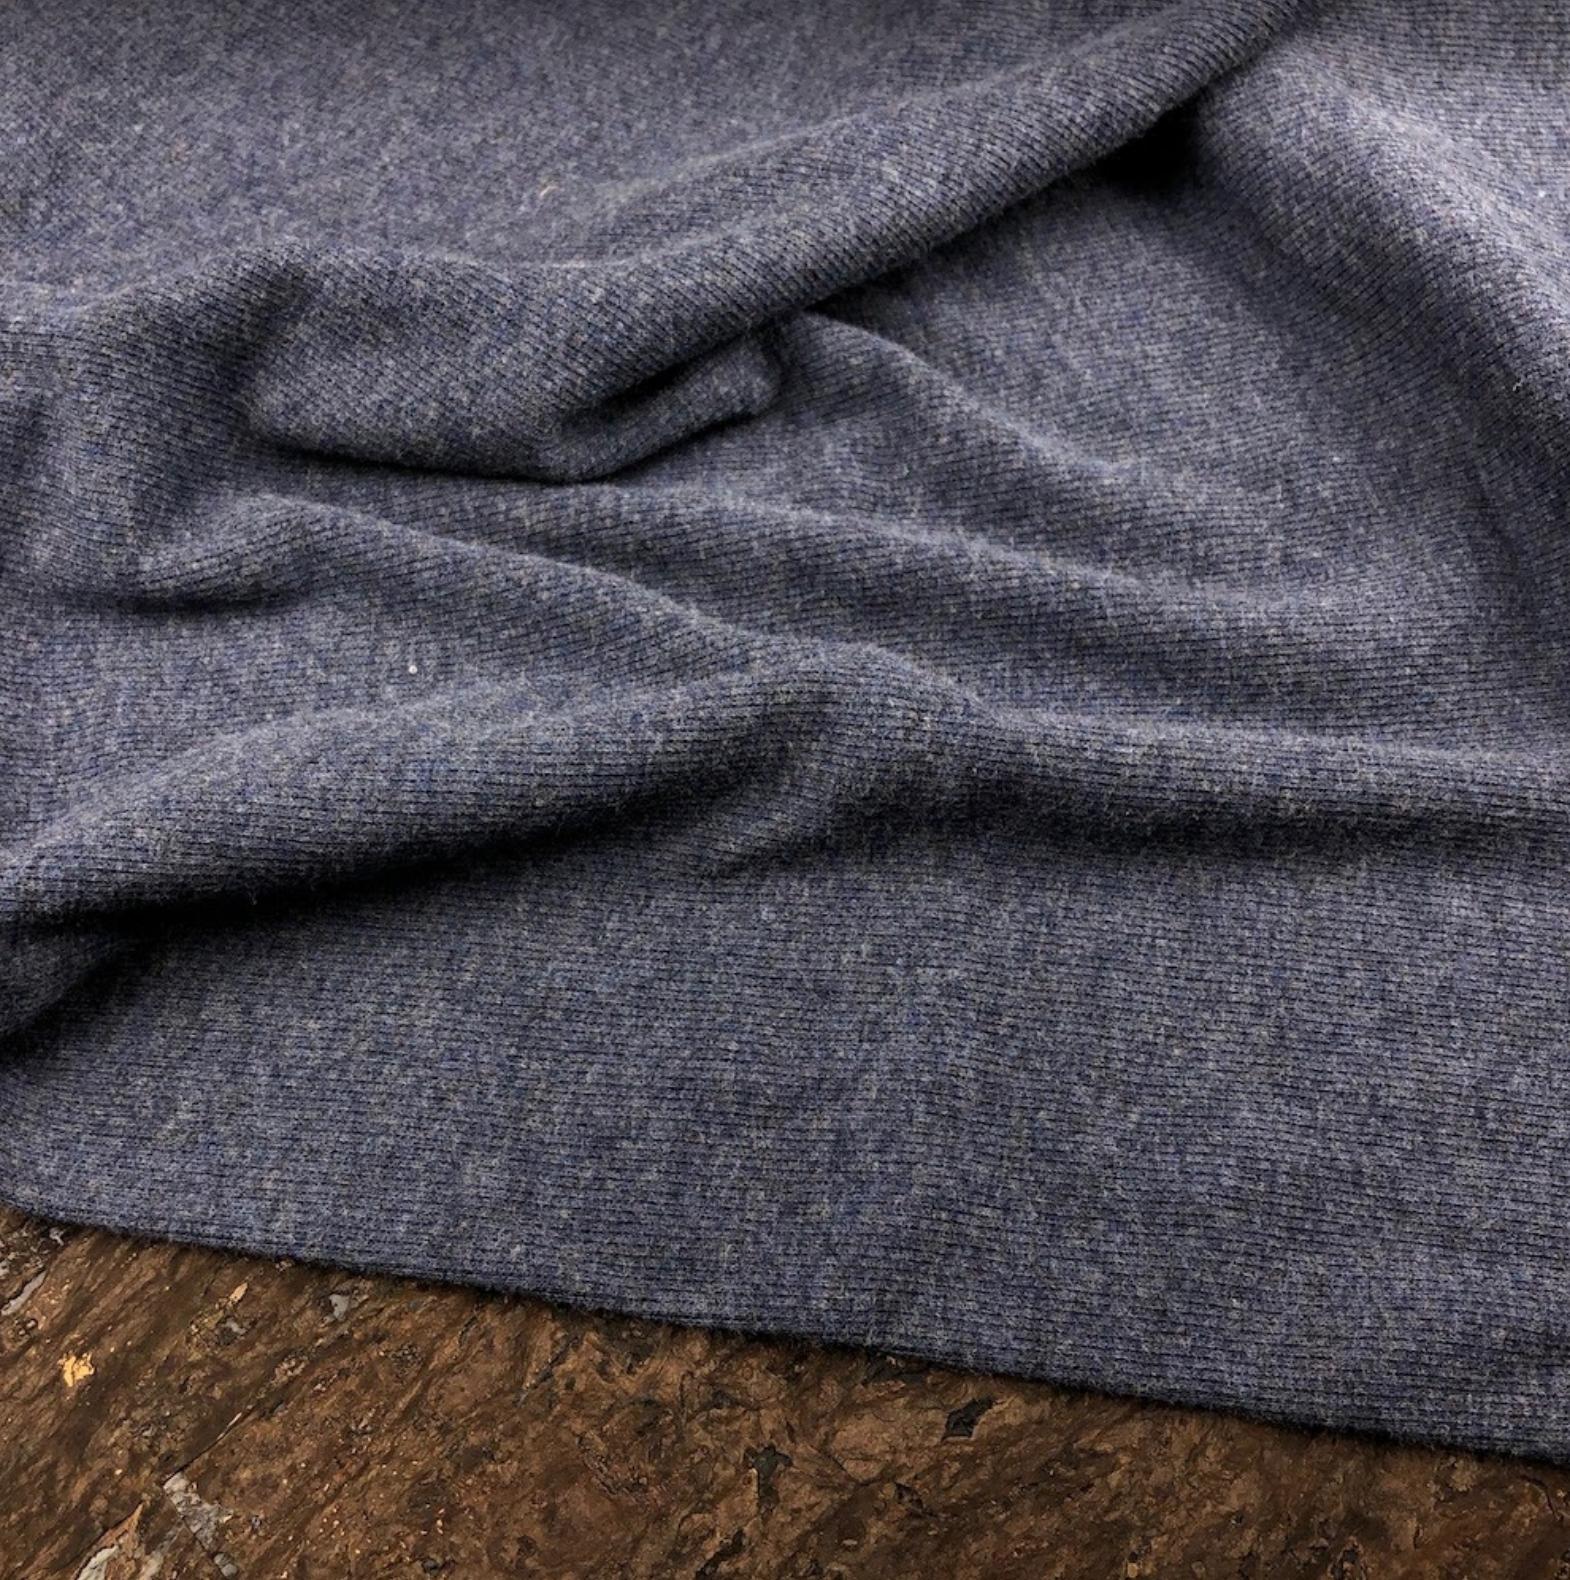 Bamboo Cotton 2x2 Rib Knit - Heather Lake - Kendor